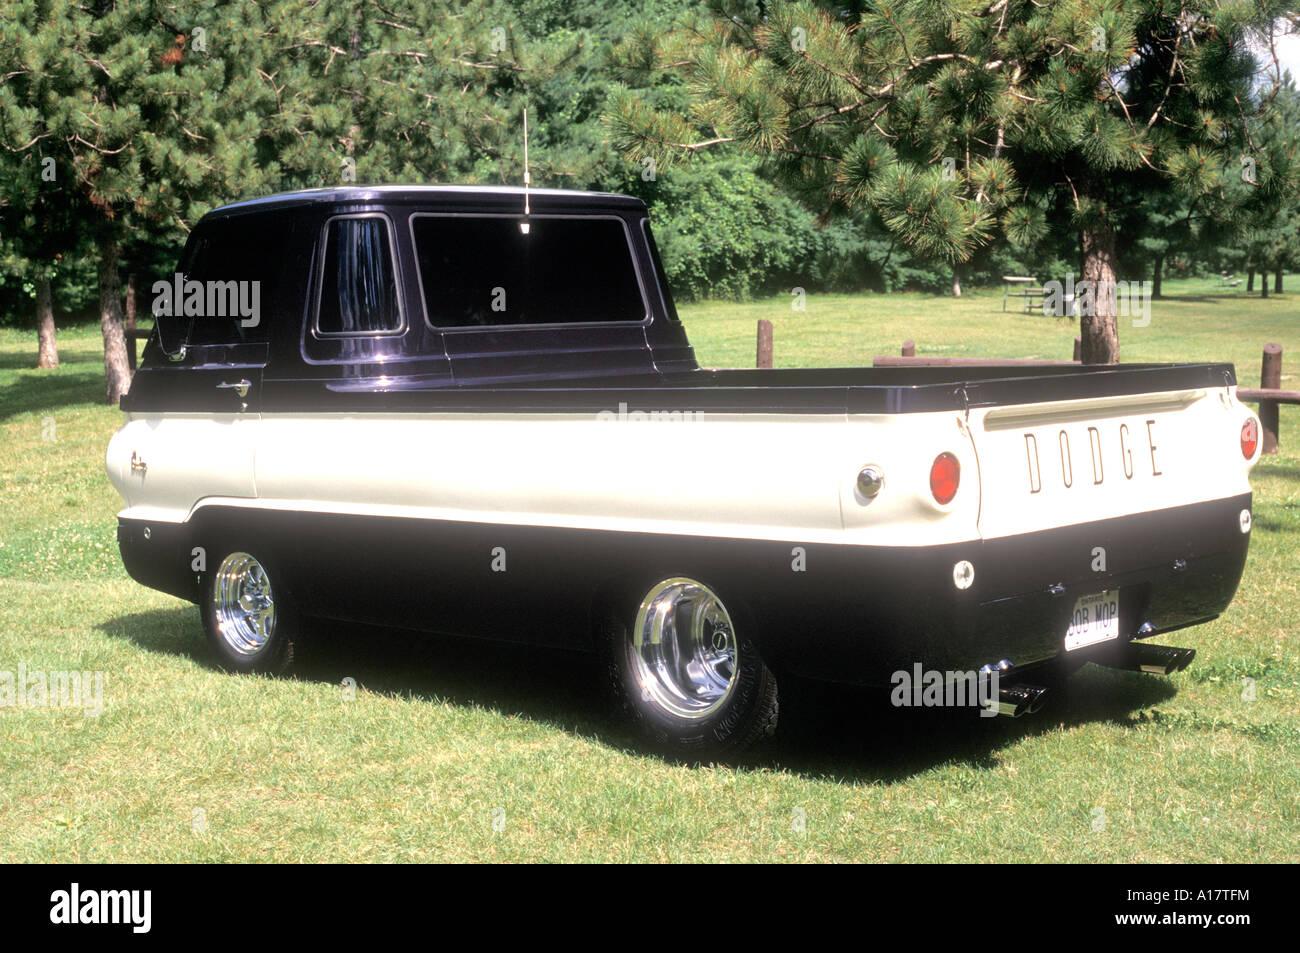 1968 dodge a 100 compact pickup truck stock photo 10172023 alamy 1968 dodge a 100 compact pickup truck publicscrutiny Choice Image